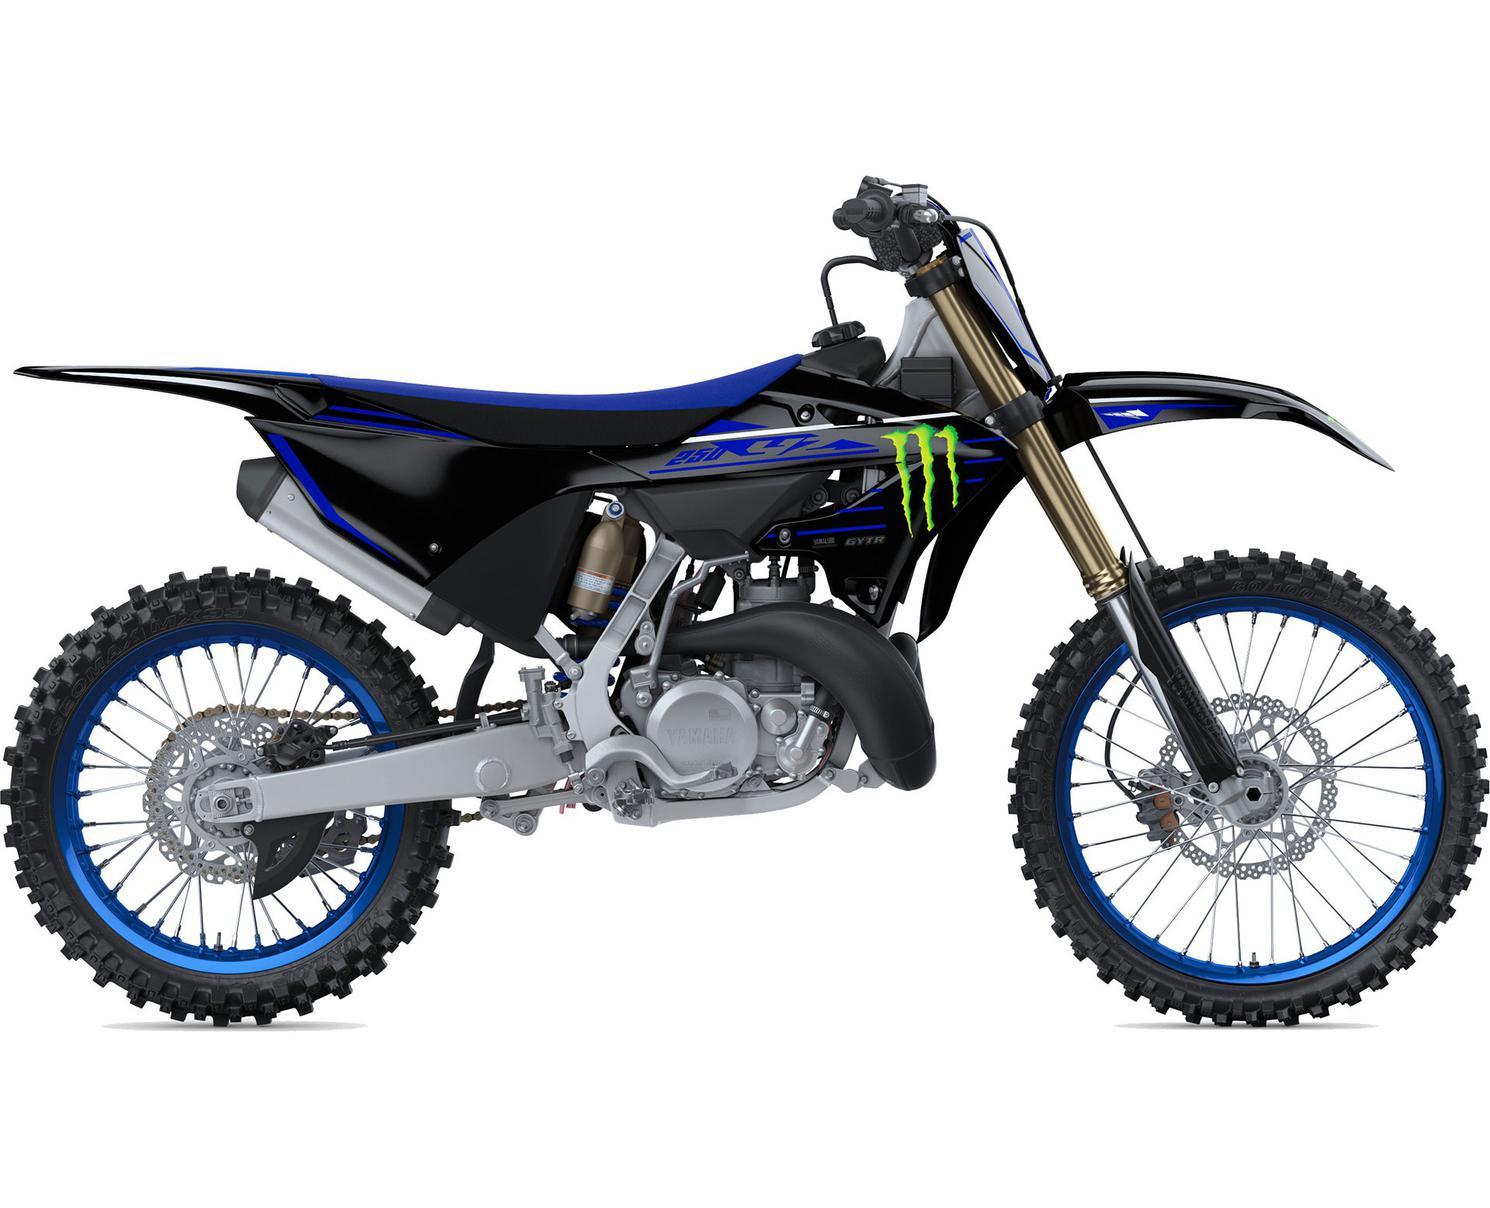 2022 Yamaha YZ250 Team Yamaha Blue